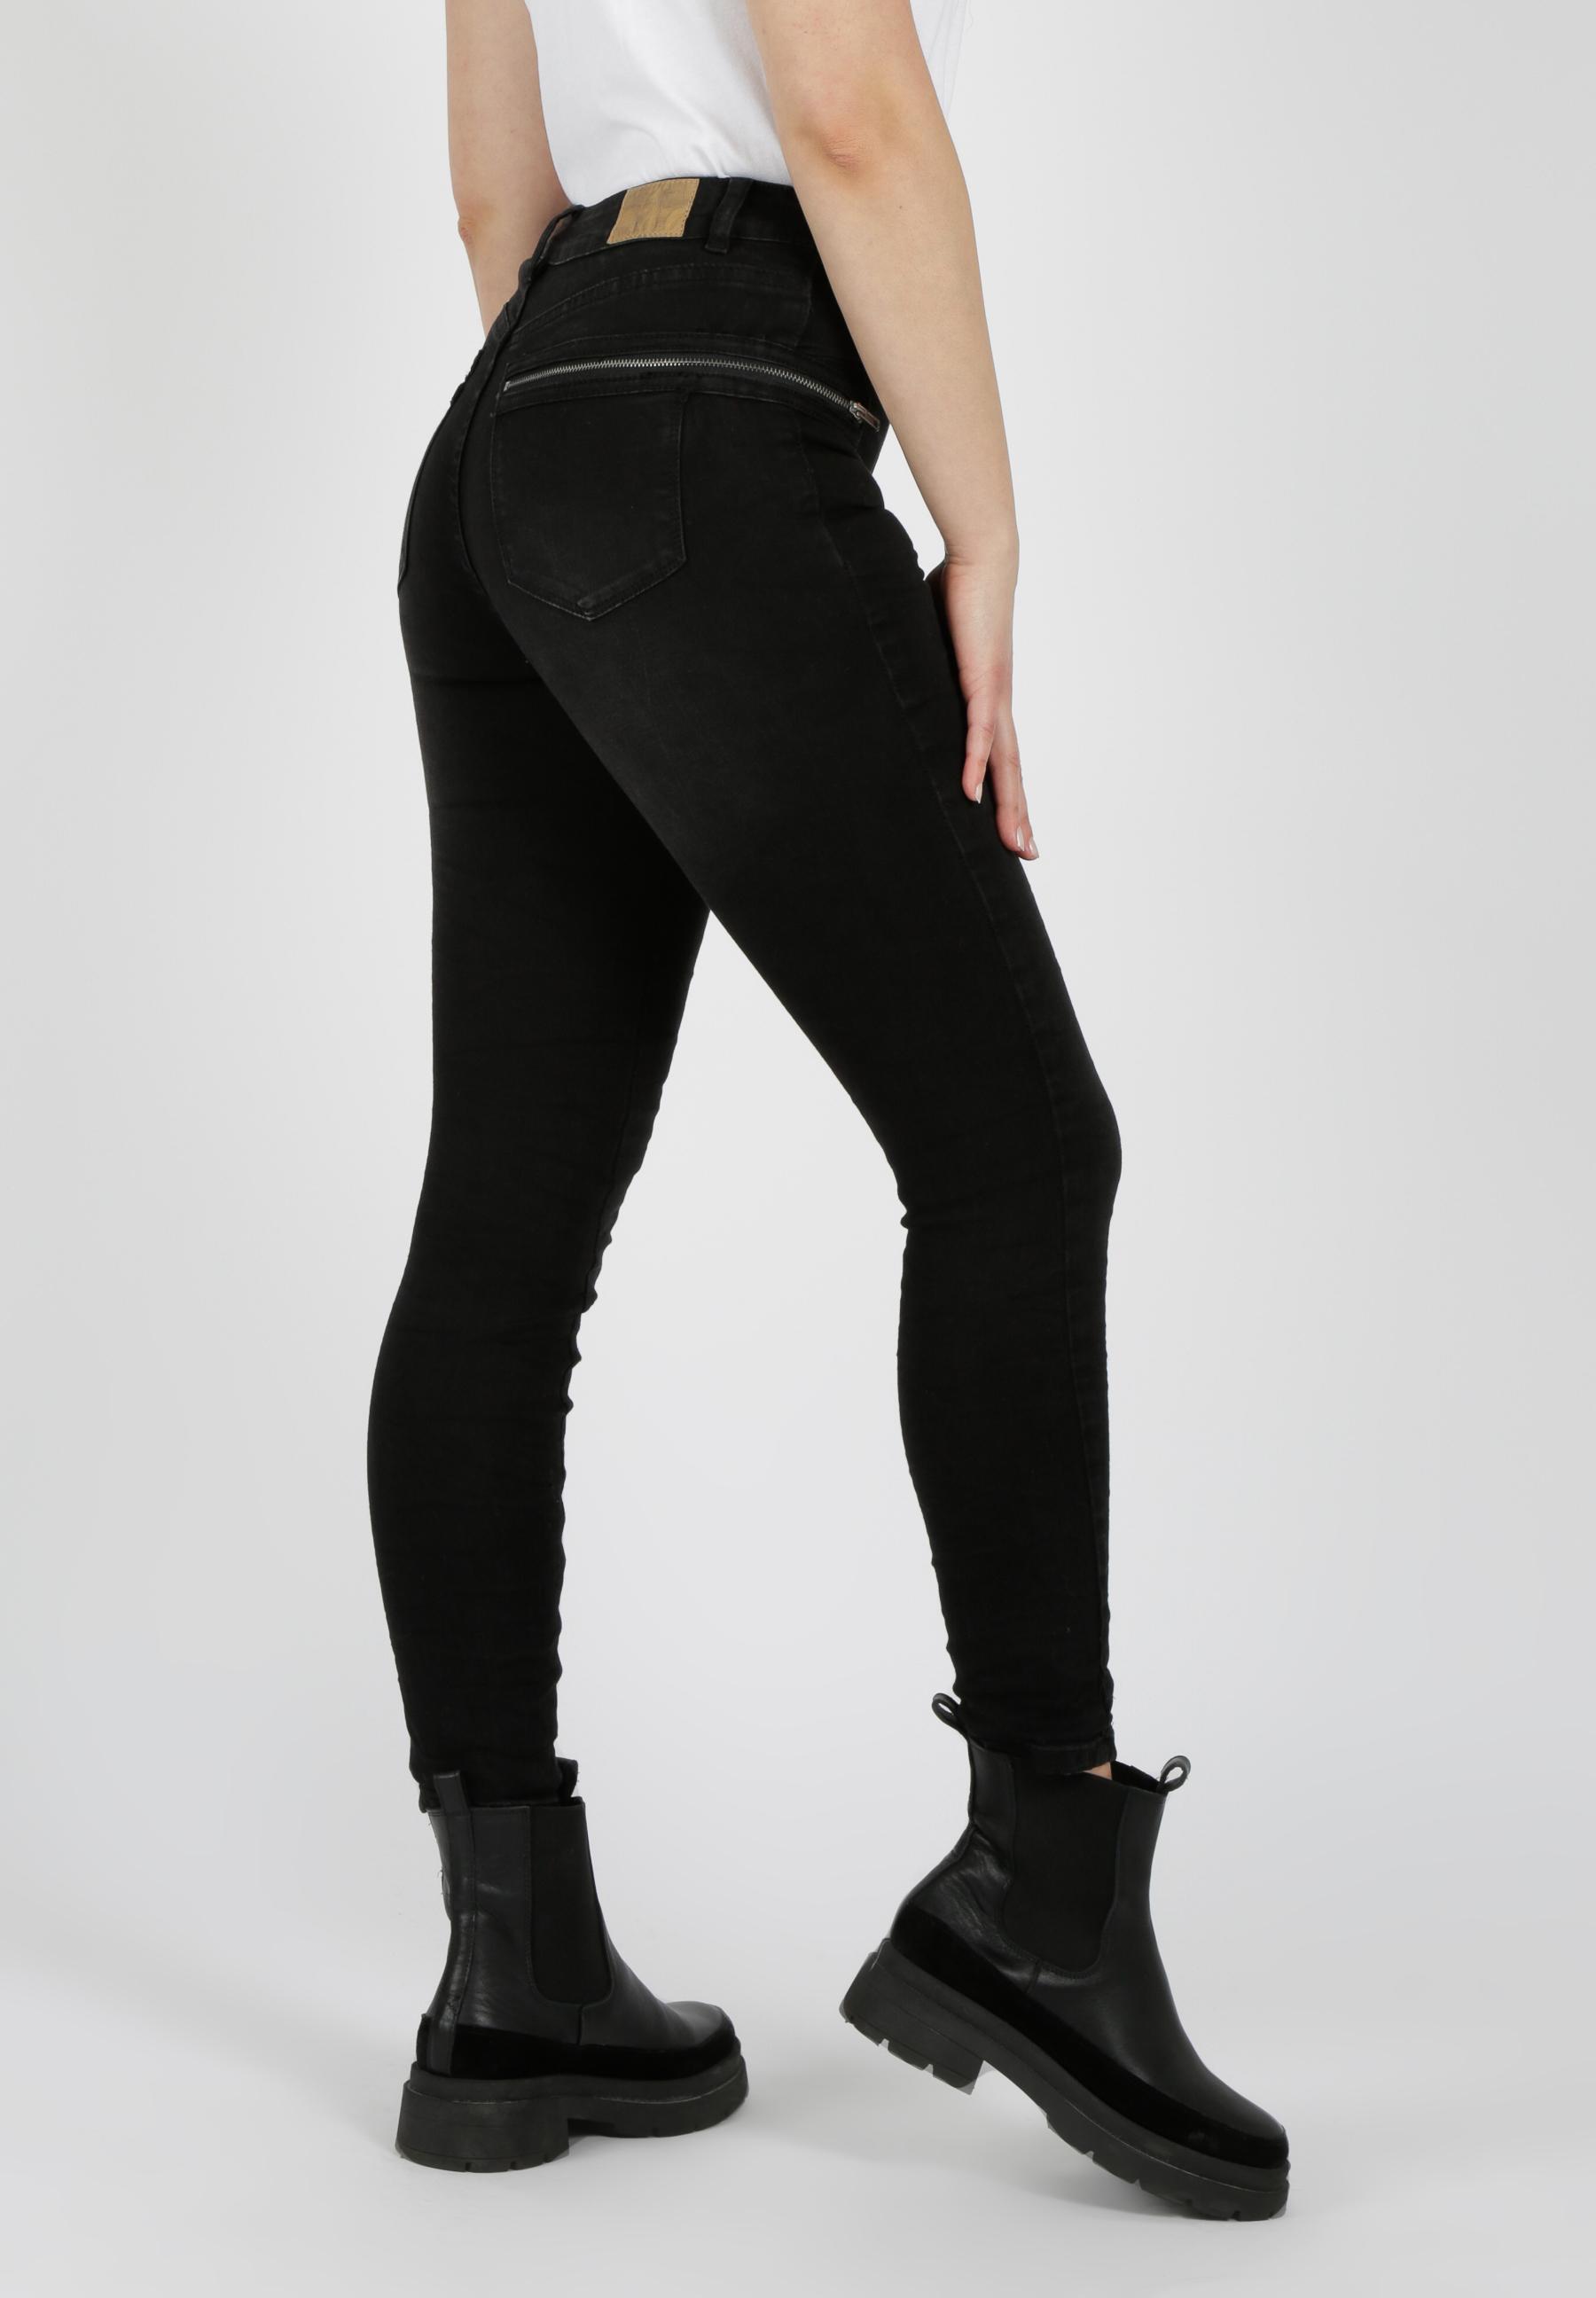 MiaZAYA Jeans Reißverschluss